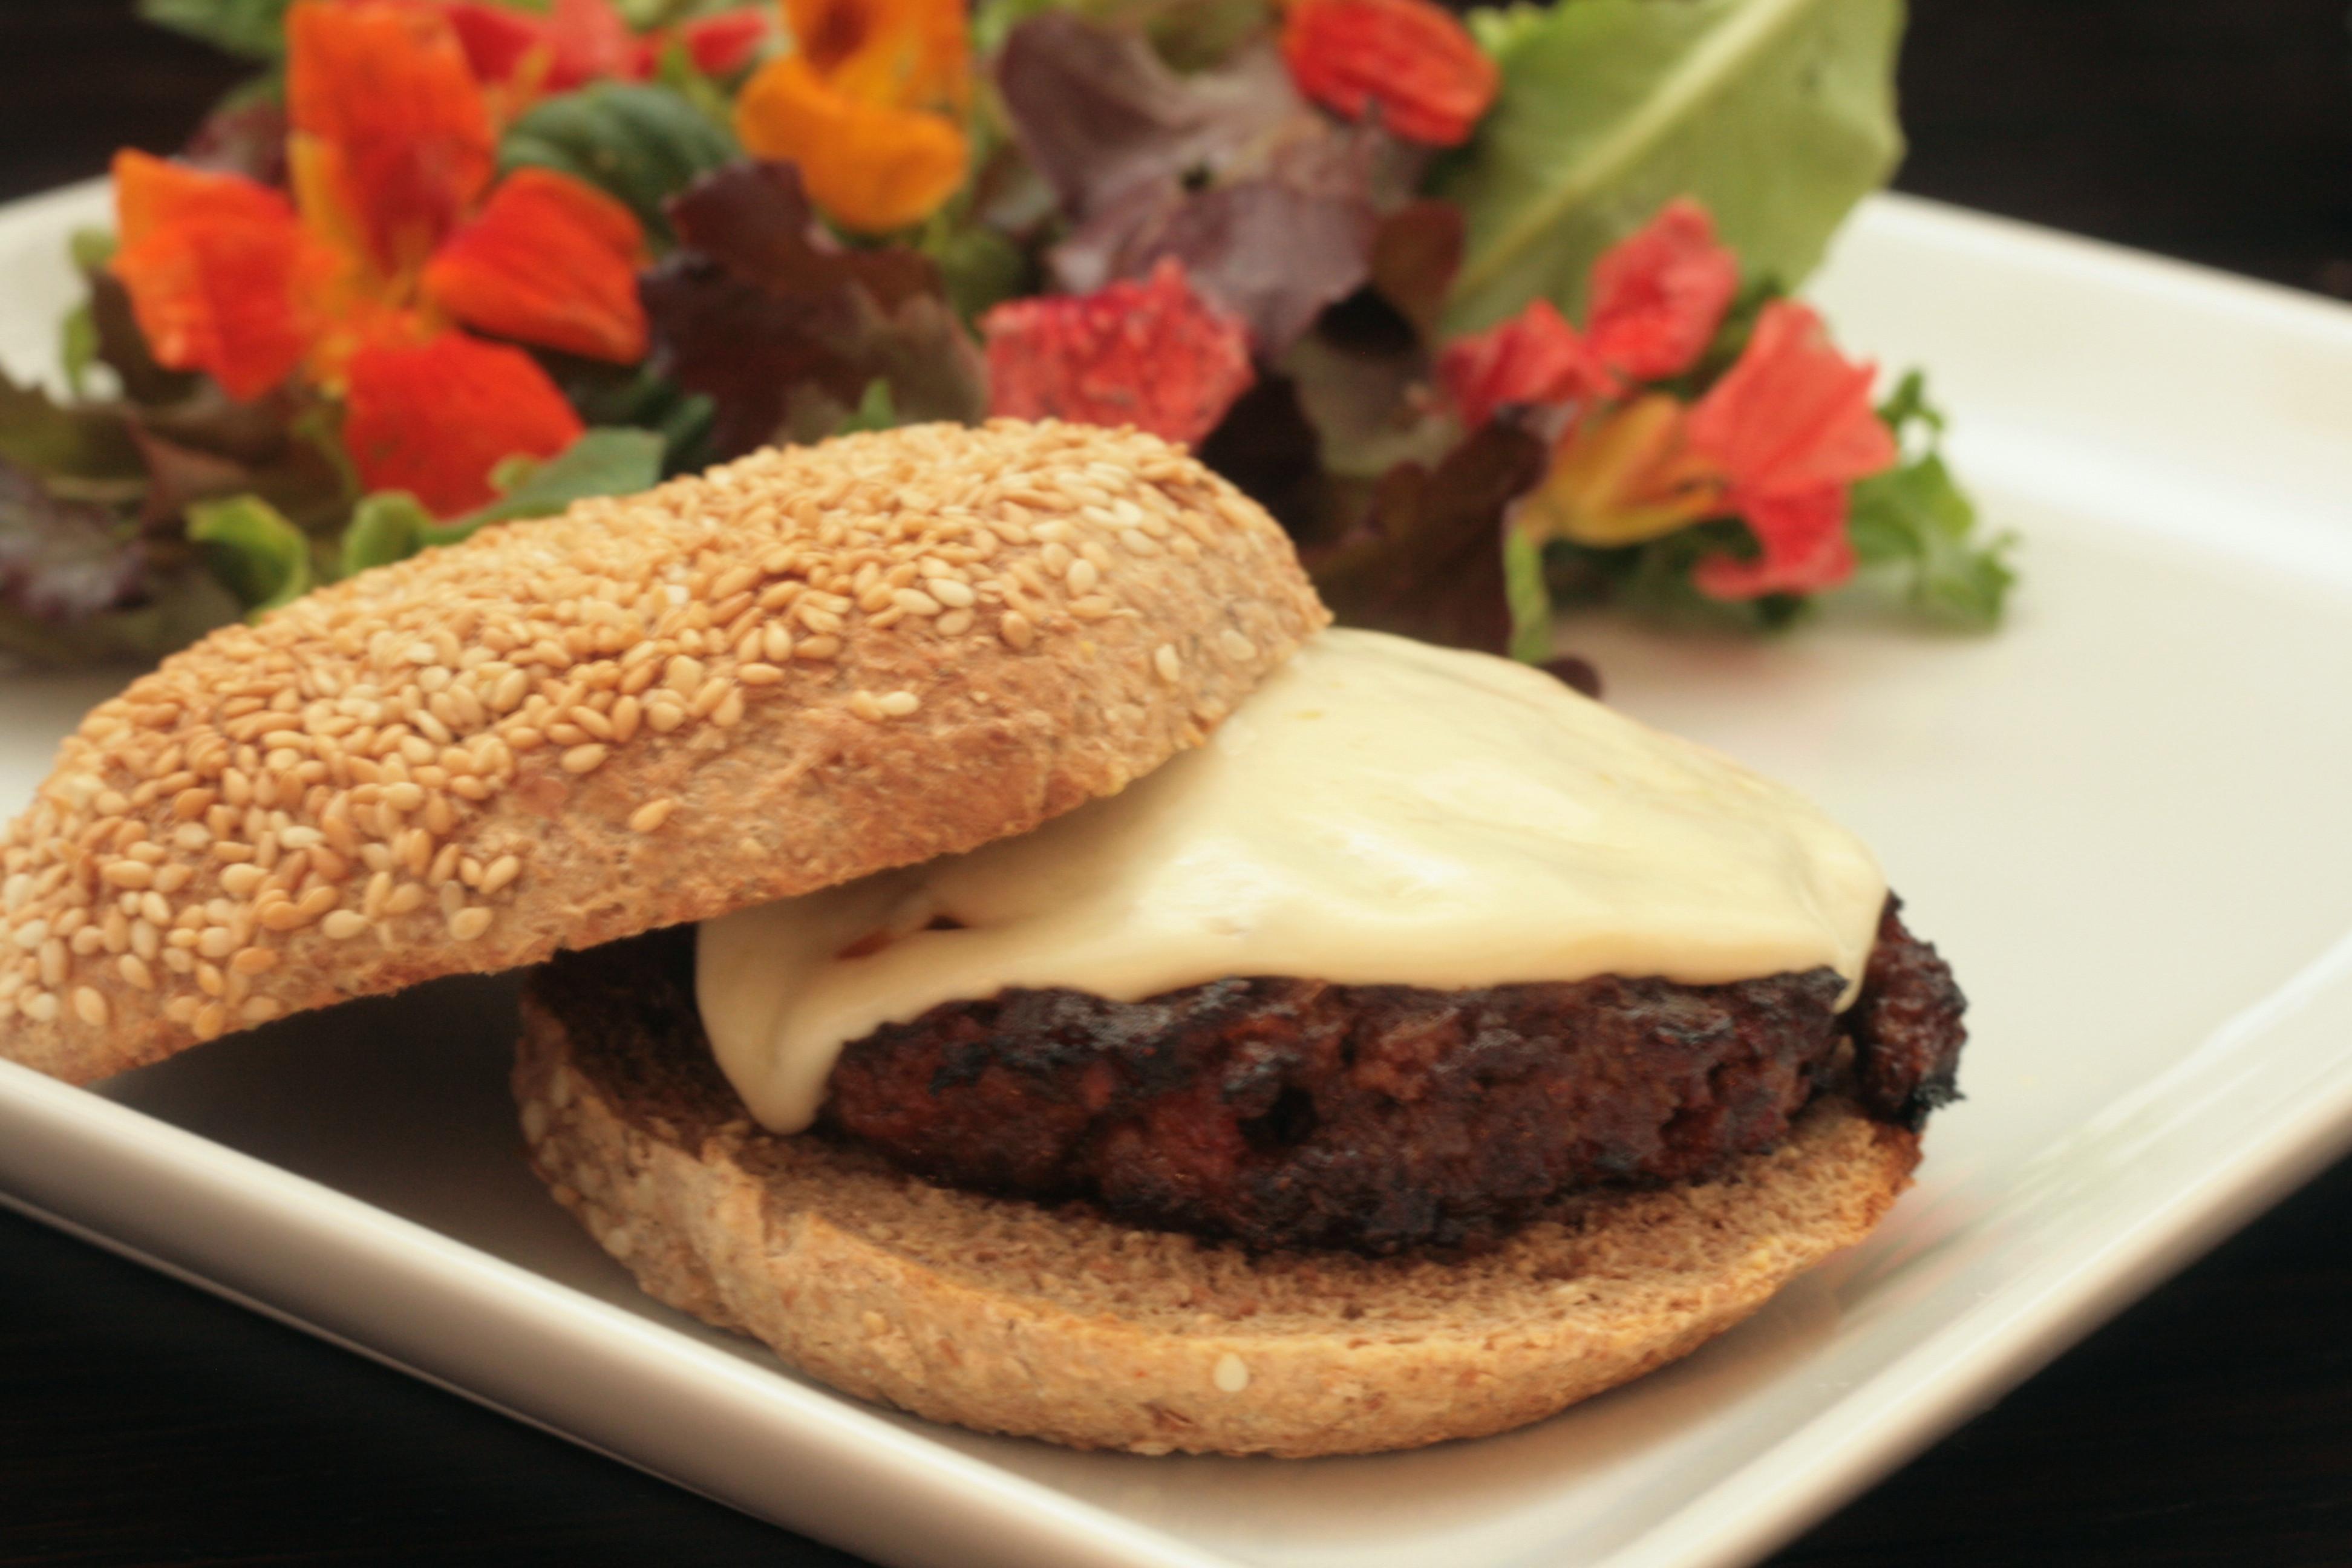 buffalo-burger-and-salad.jpg